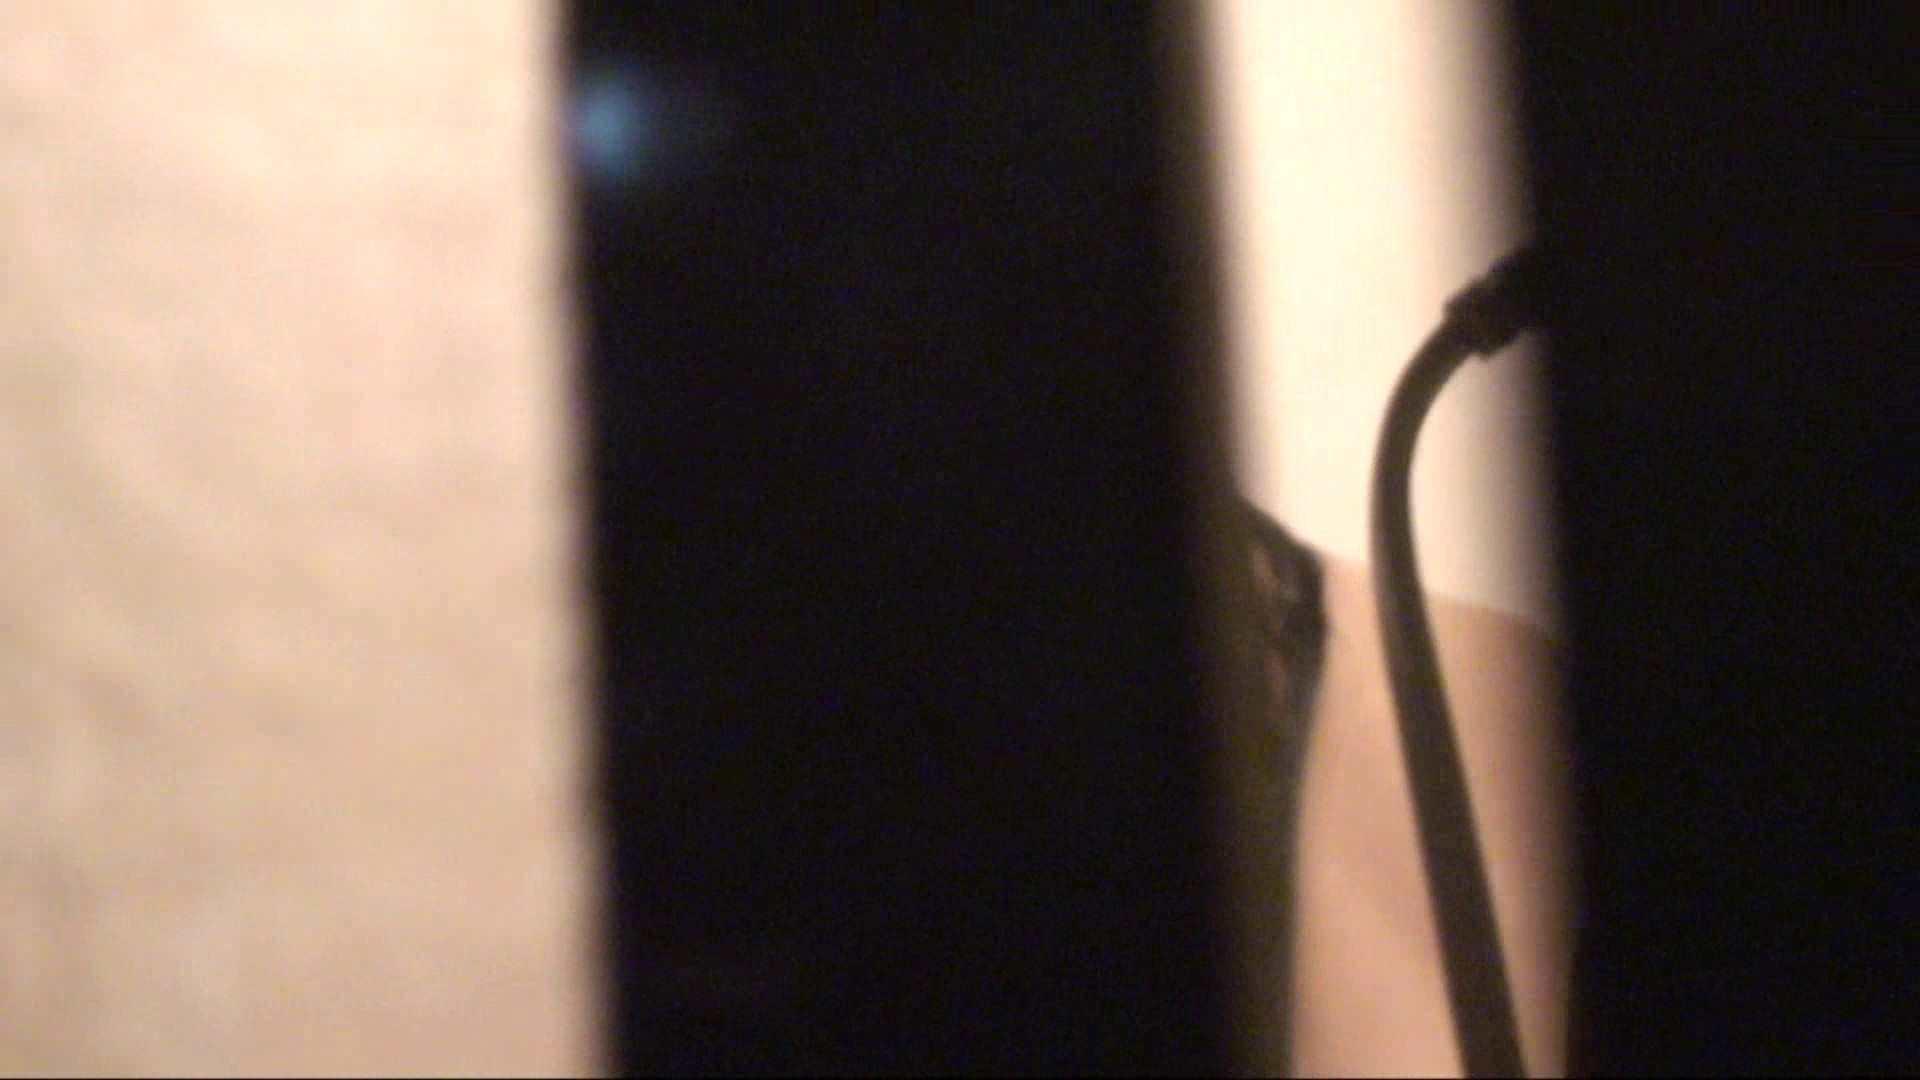 vol.01必見!白肌嬢の乳首が丸見え。極上美人のすっぴん顔をハイビジョンで! 乳首 オメコ動画キャプチャ 89pic 4